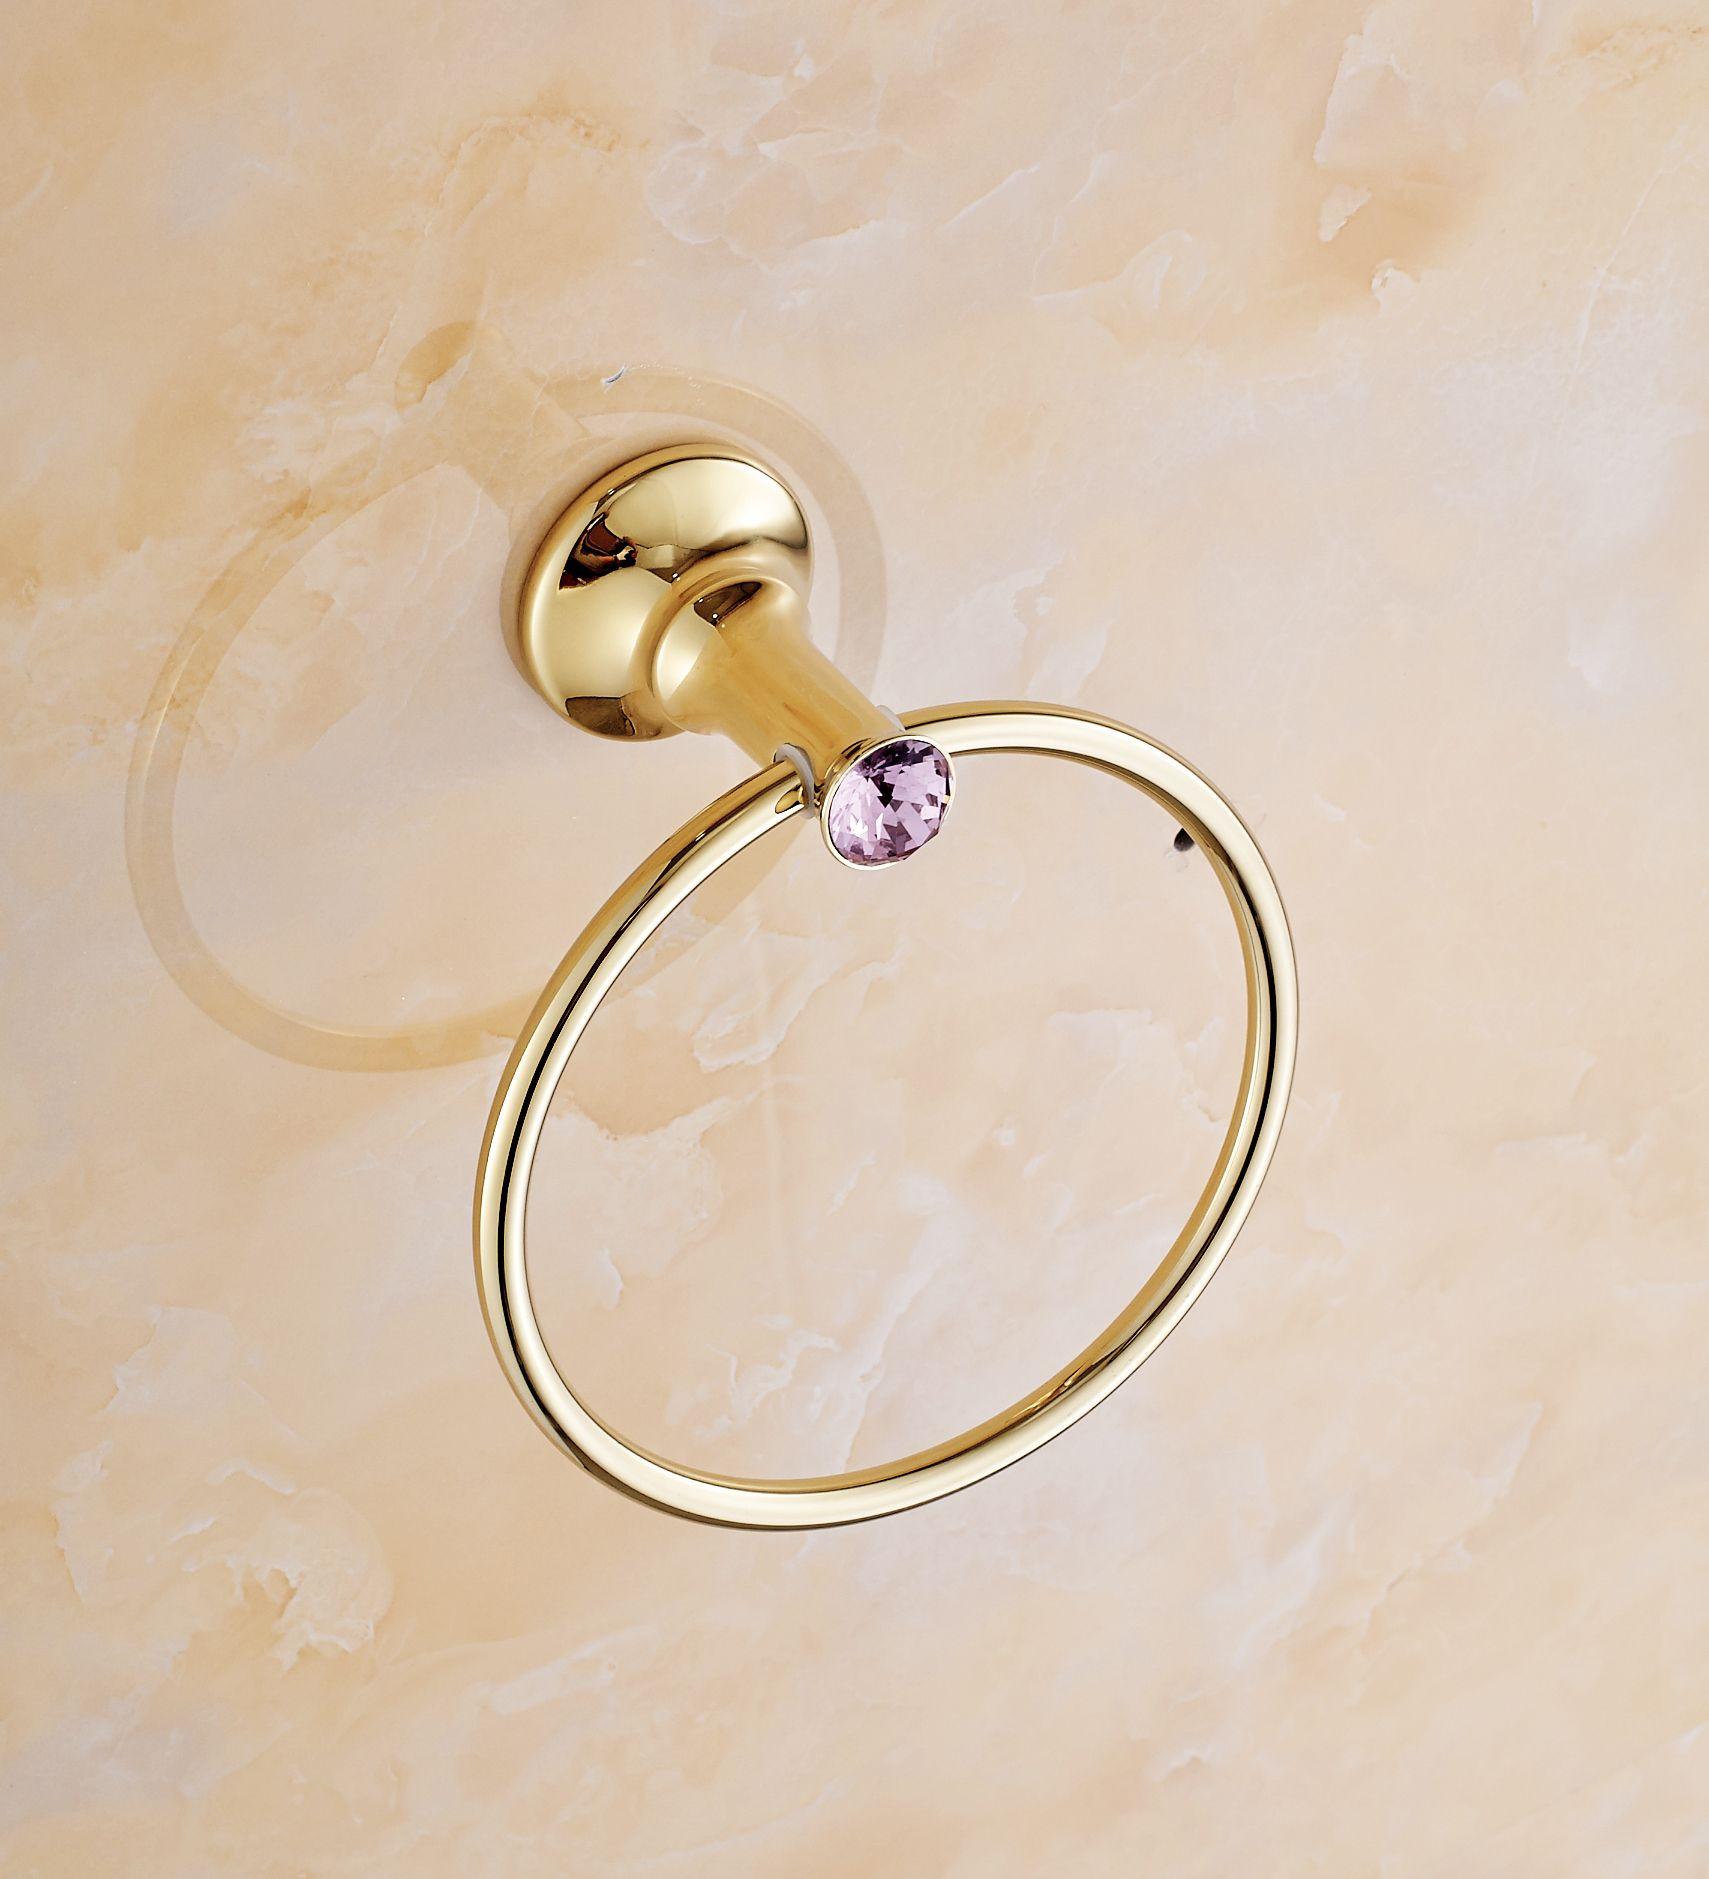 Violet Crystal Towel Ring Brass Bathroom Towel Rack Solid Brass ...